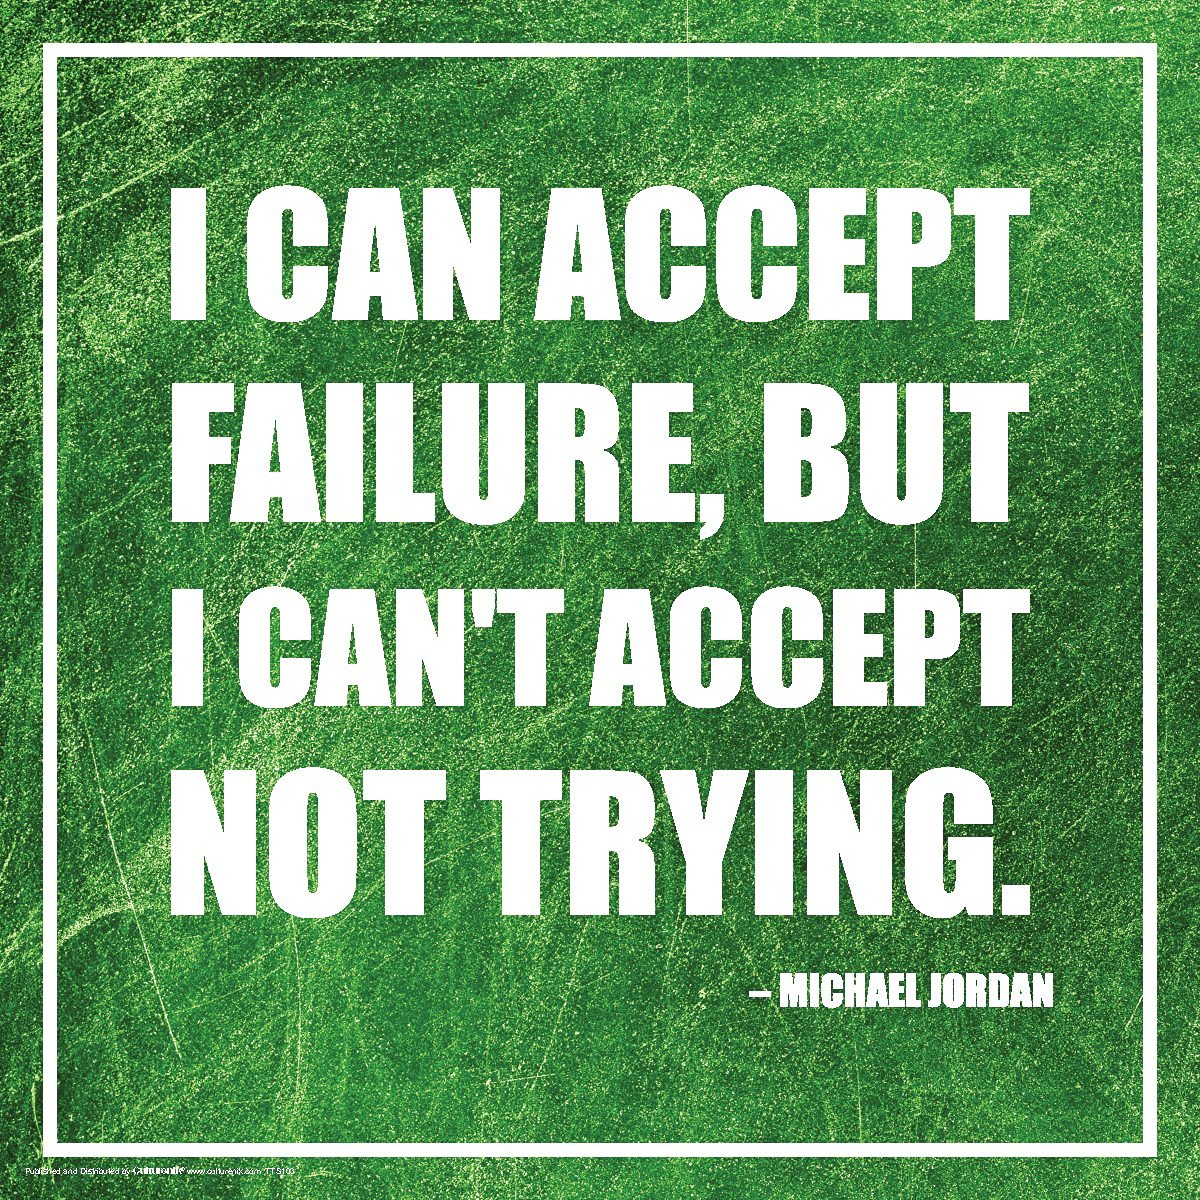 Buy Michael Jordan Failure Inspirational Motivational Sports